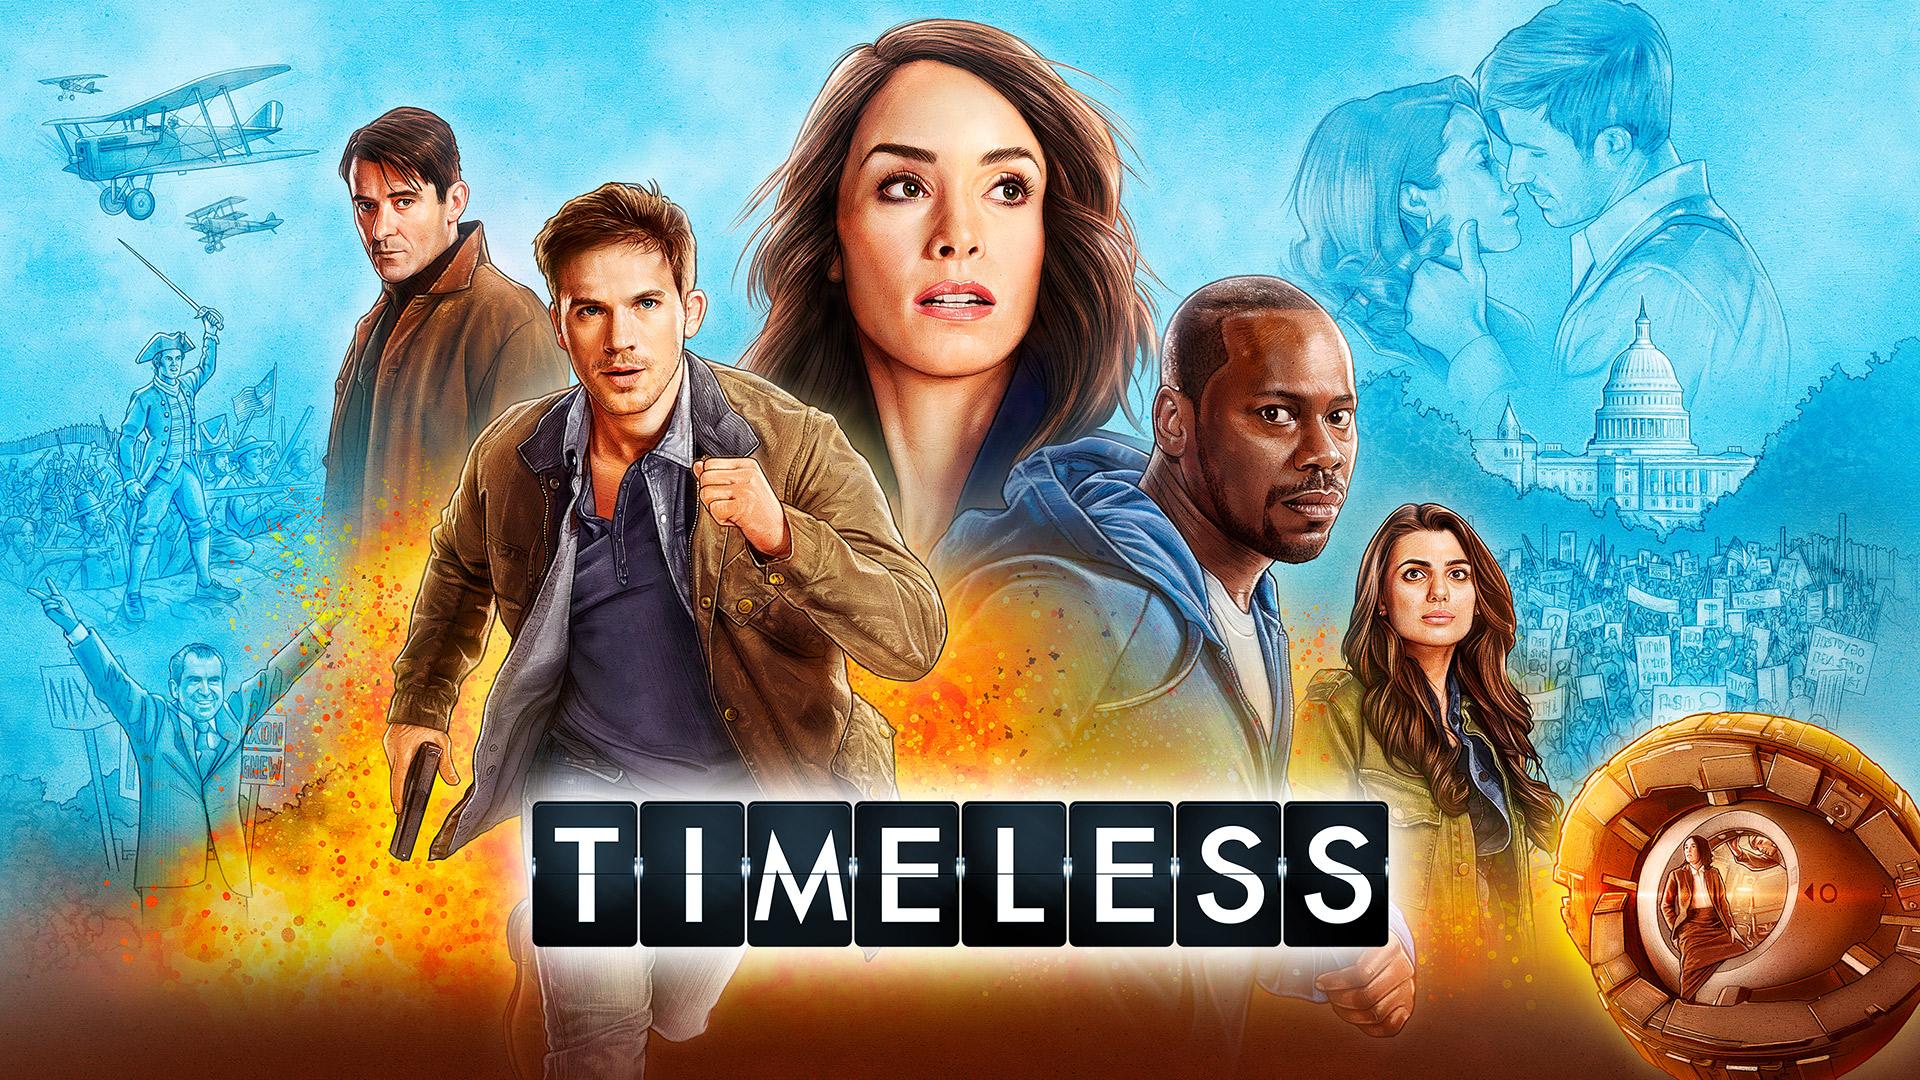 Watch Timeless Episodes - NBC com